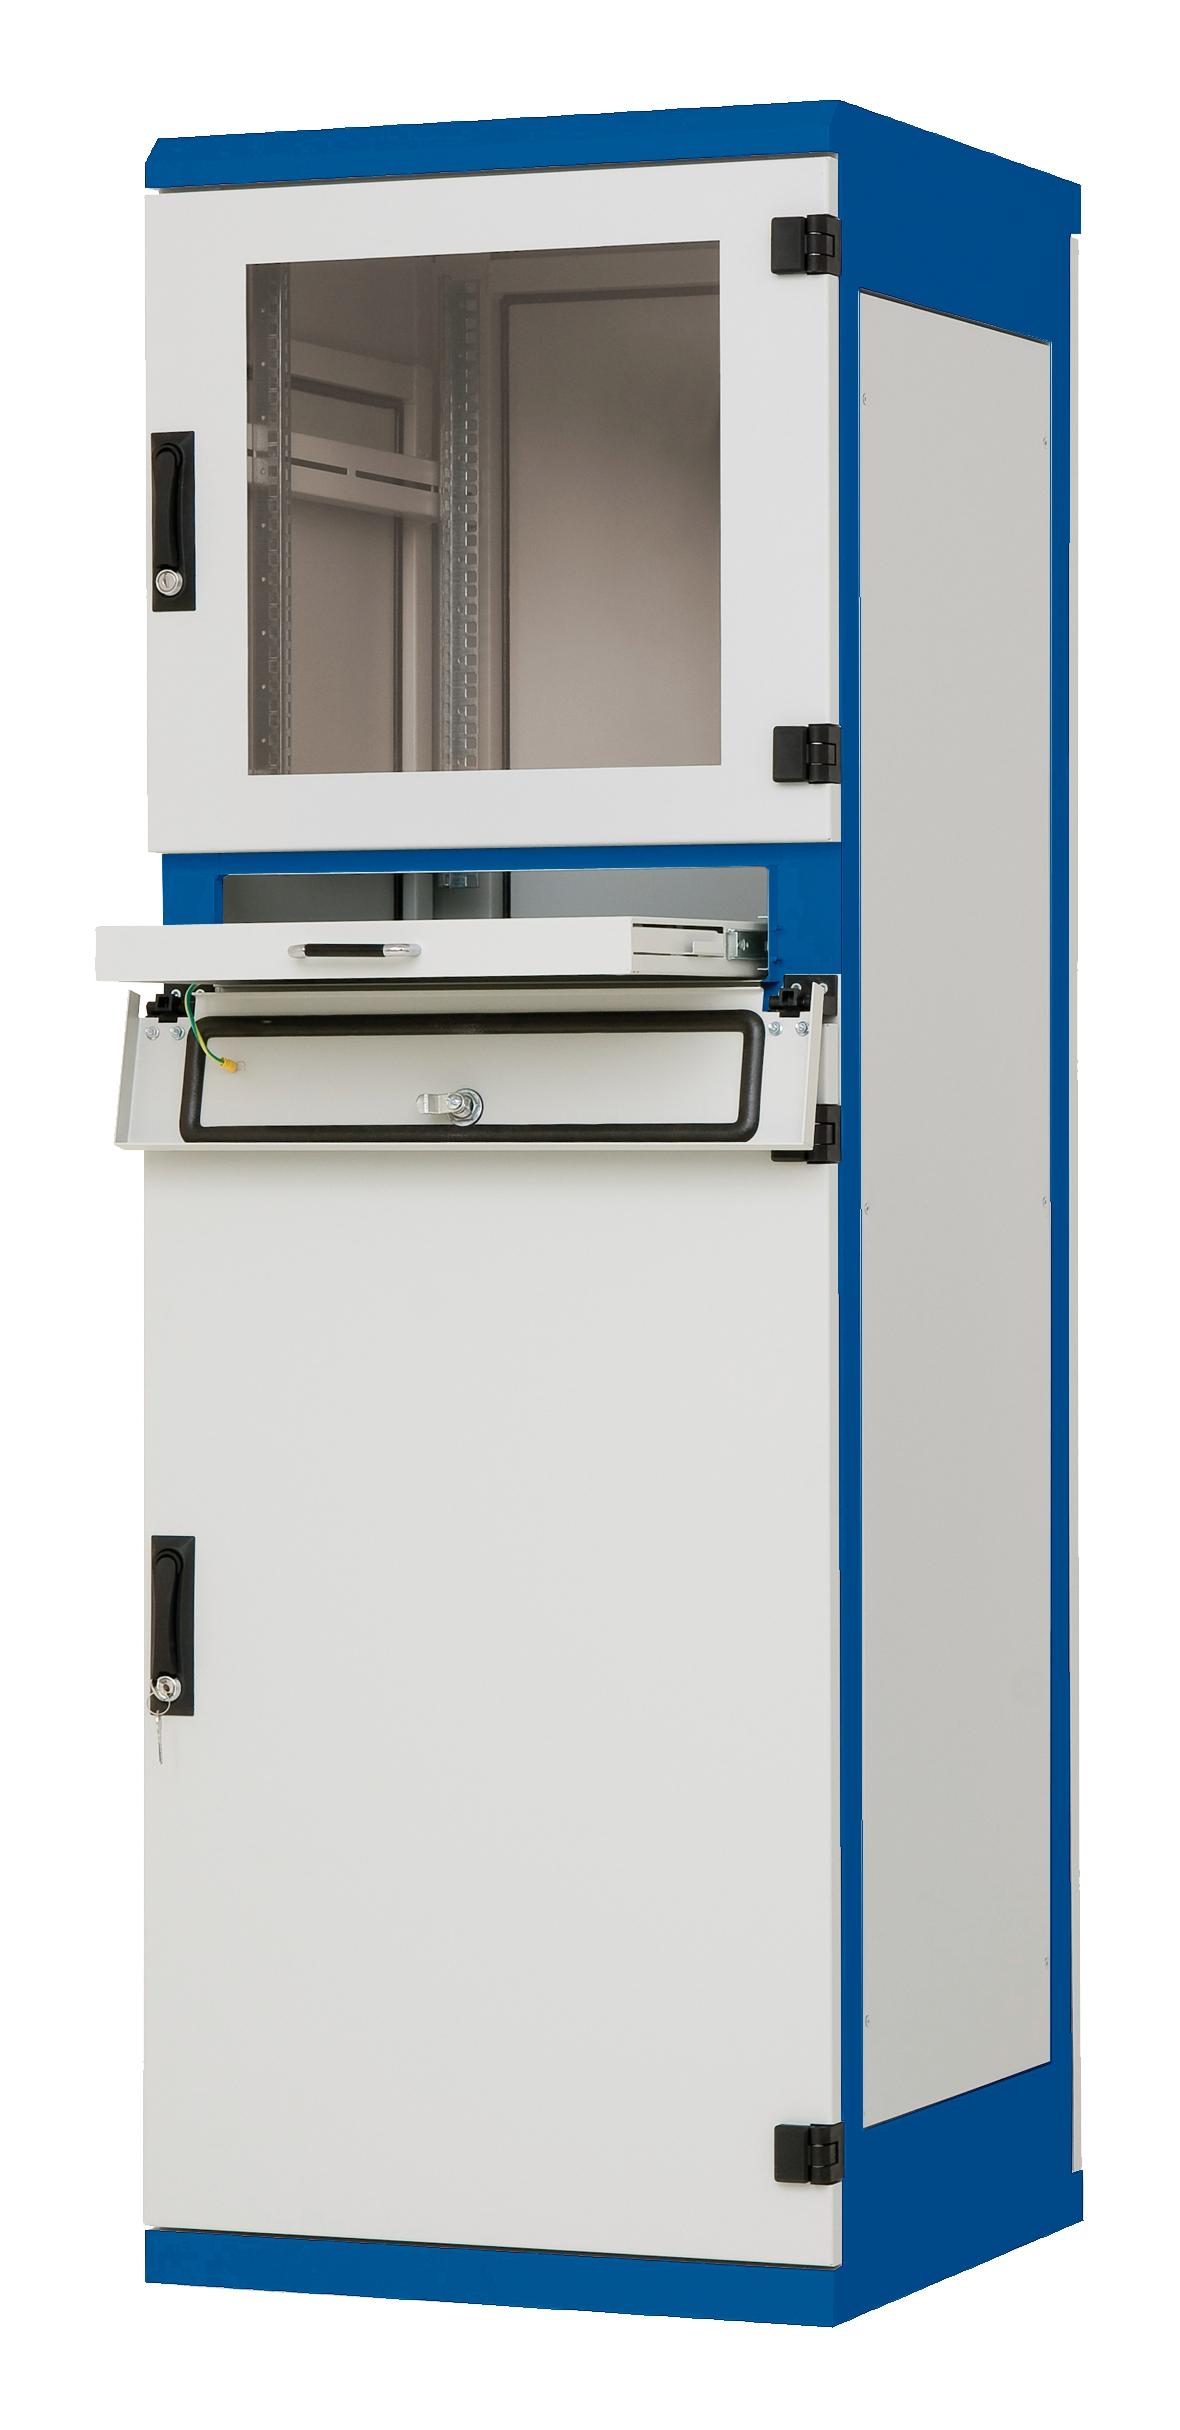 1 Stk Industrie-Steuerungsschrank B600xH1750xT600, 19, 37HE, IP54 DSP376065-